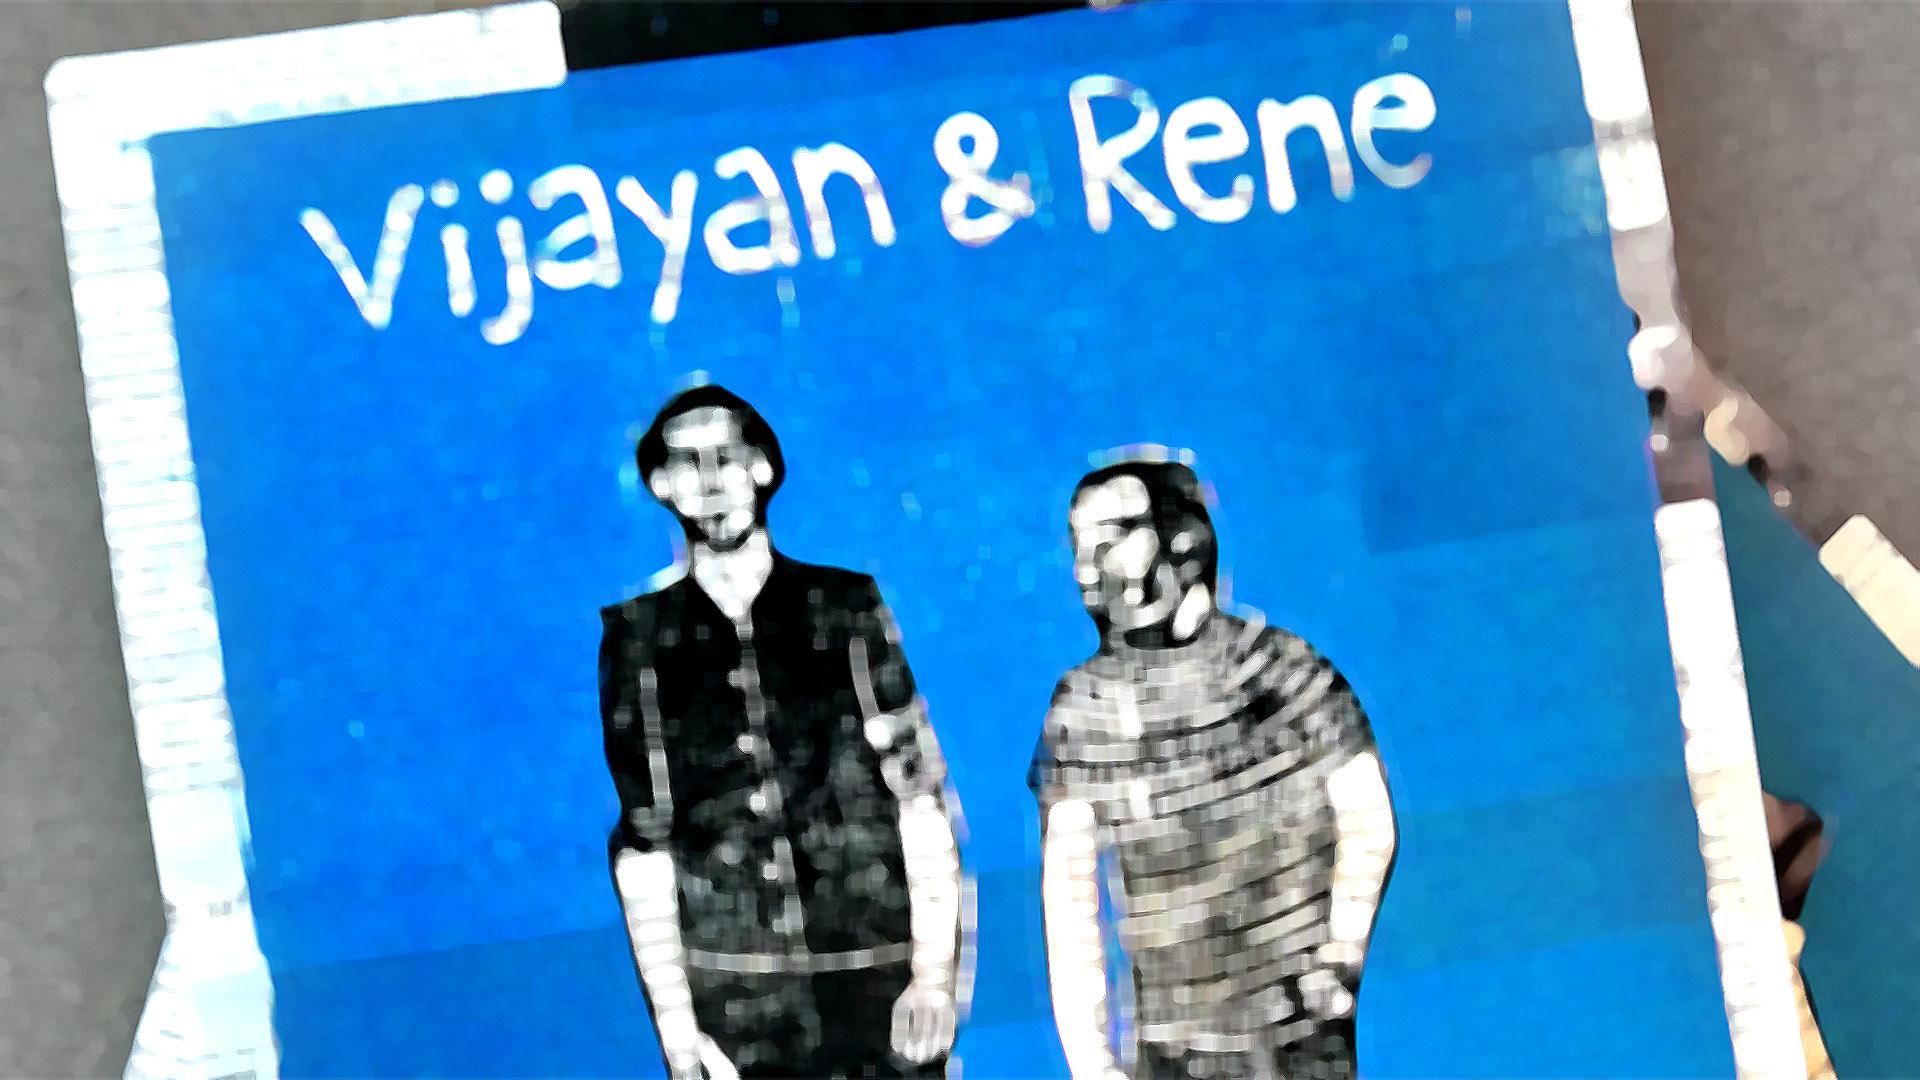 Vijayan & René